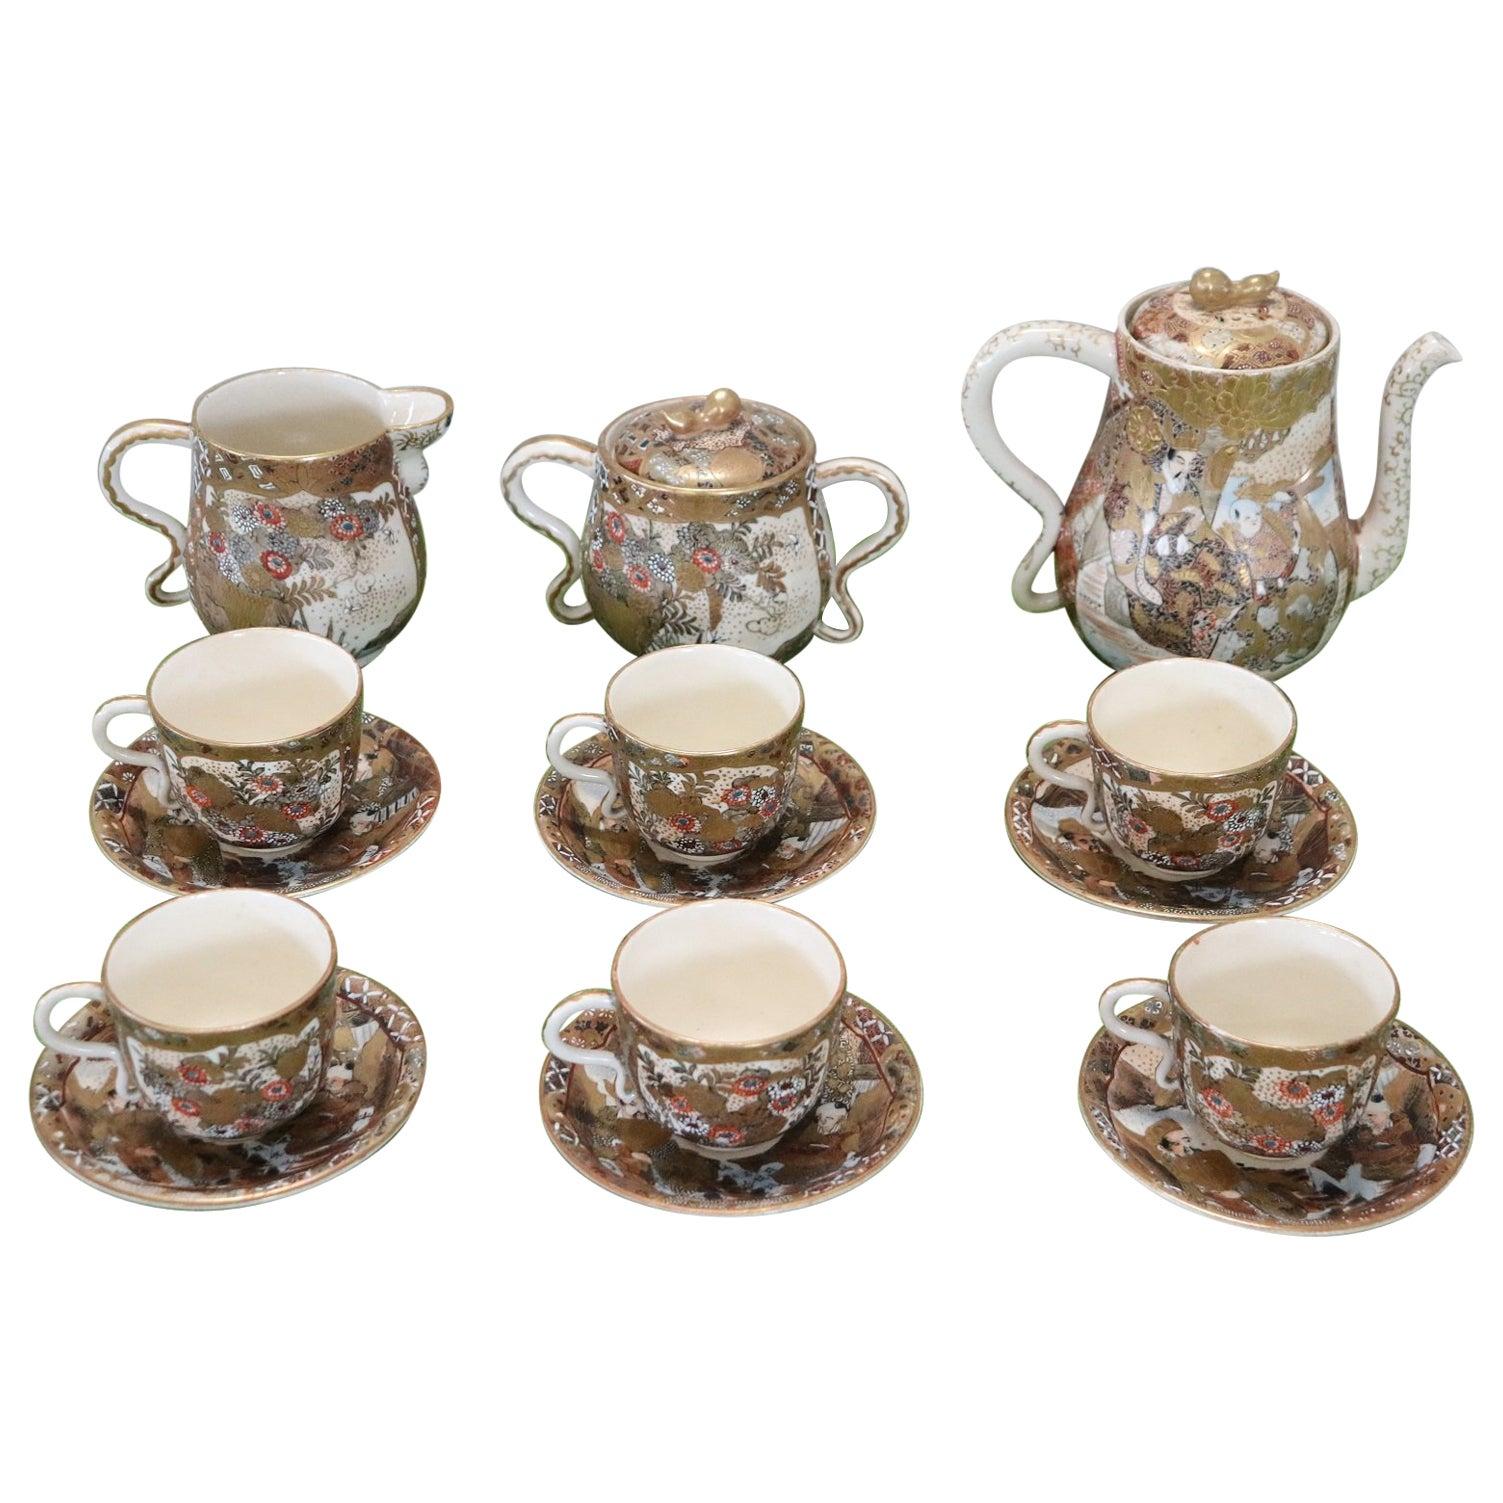 19th Century Satsuma Japanese Hand Painted Porcelain Tea or Coffee Set 15 Pieces